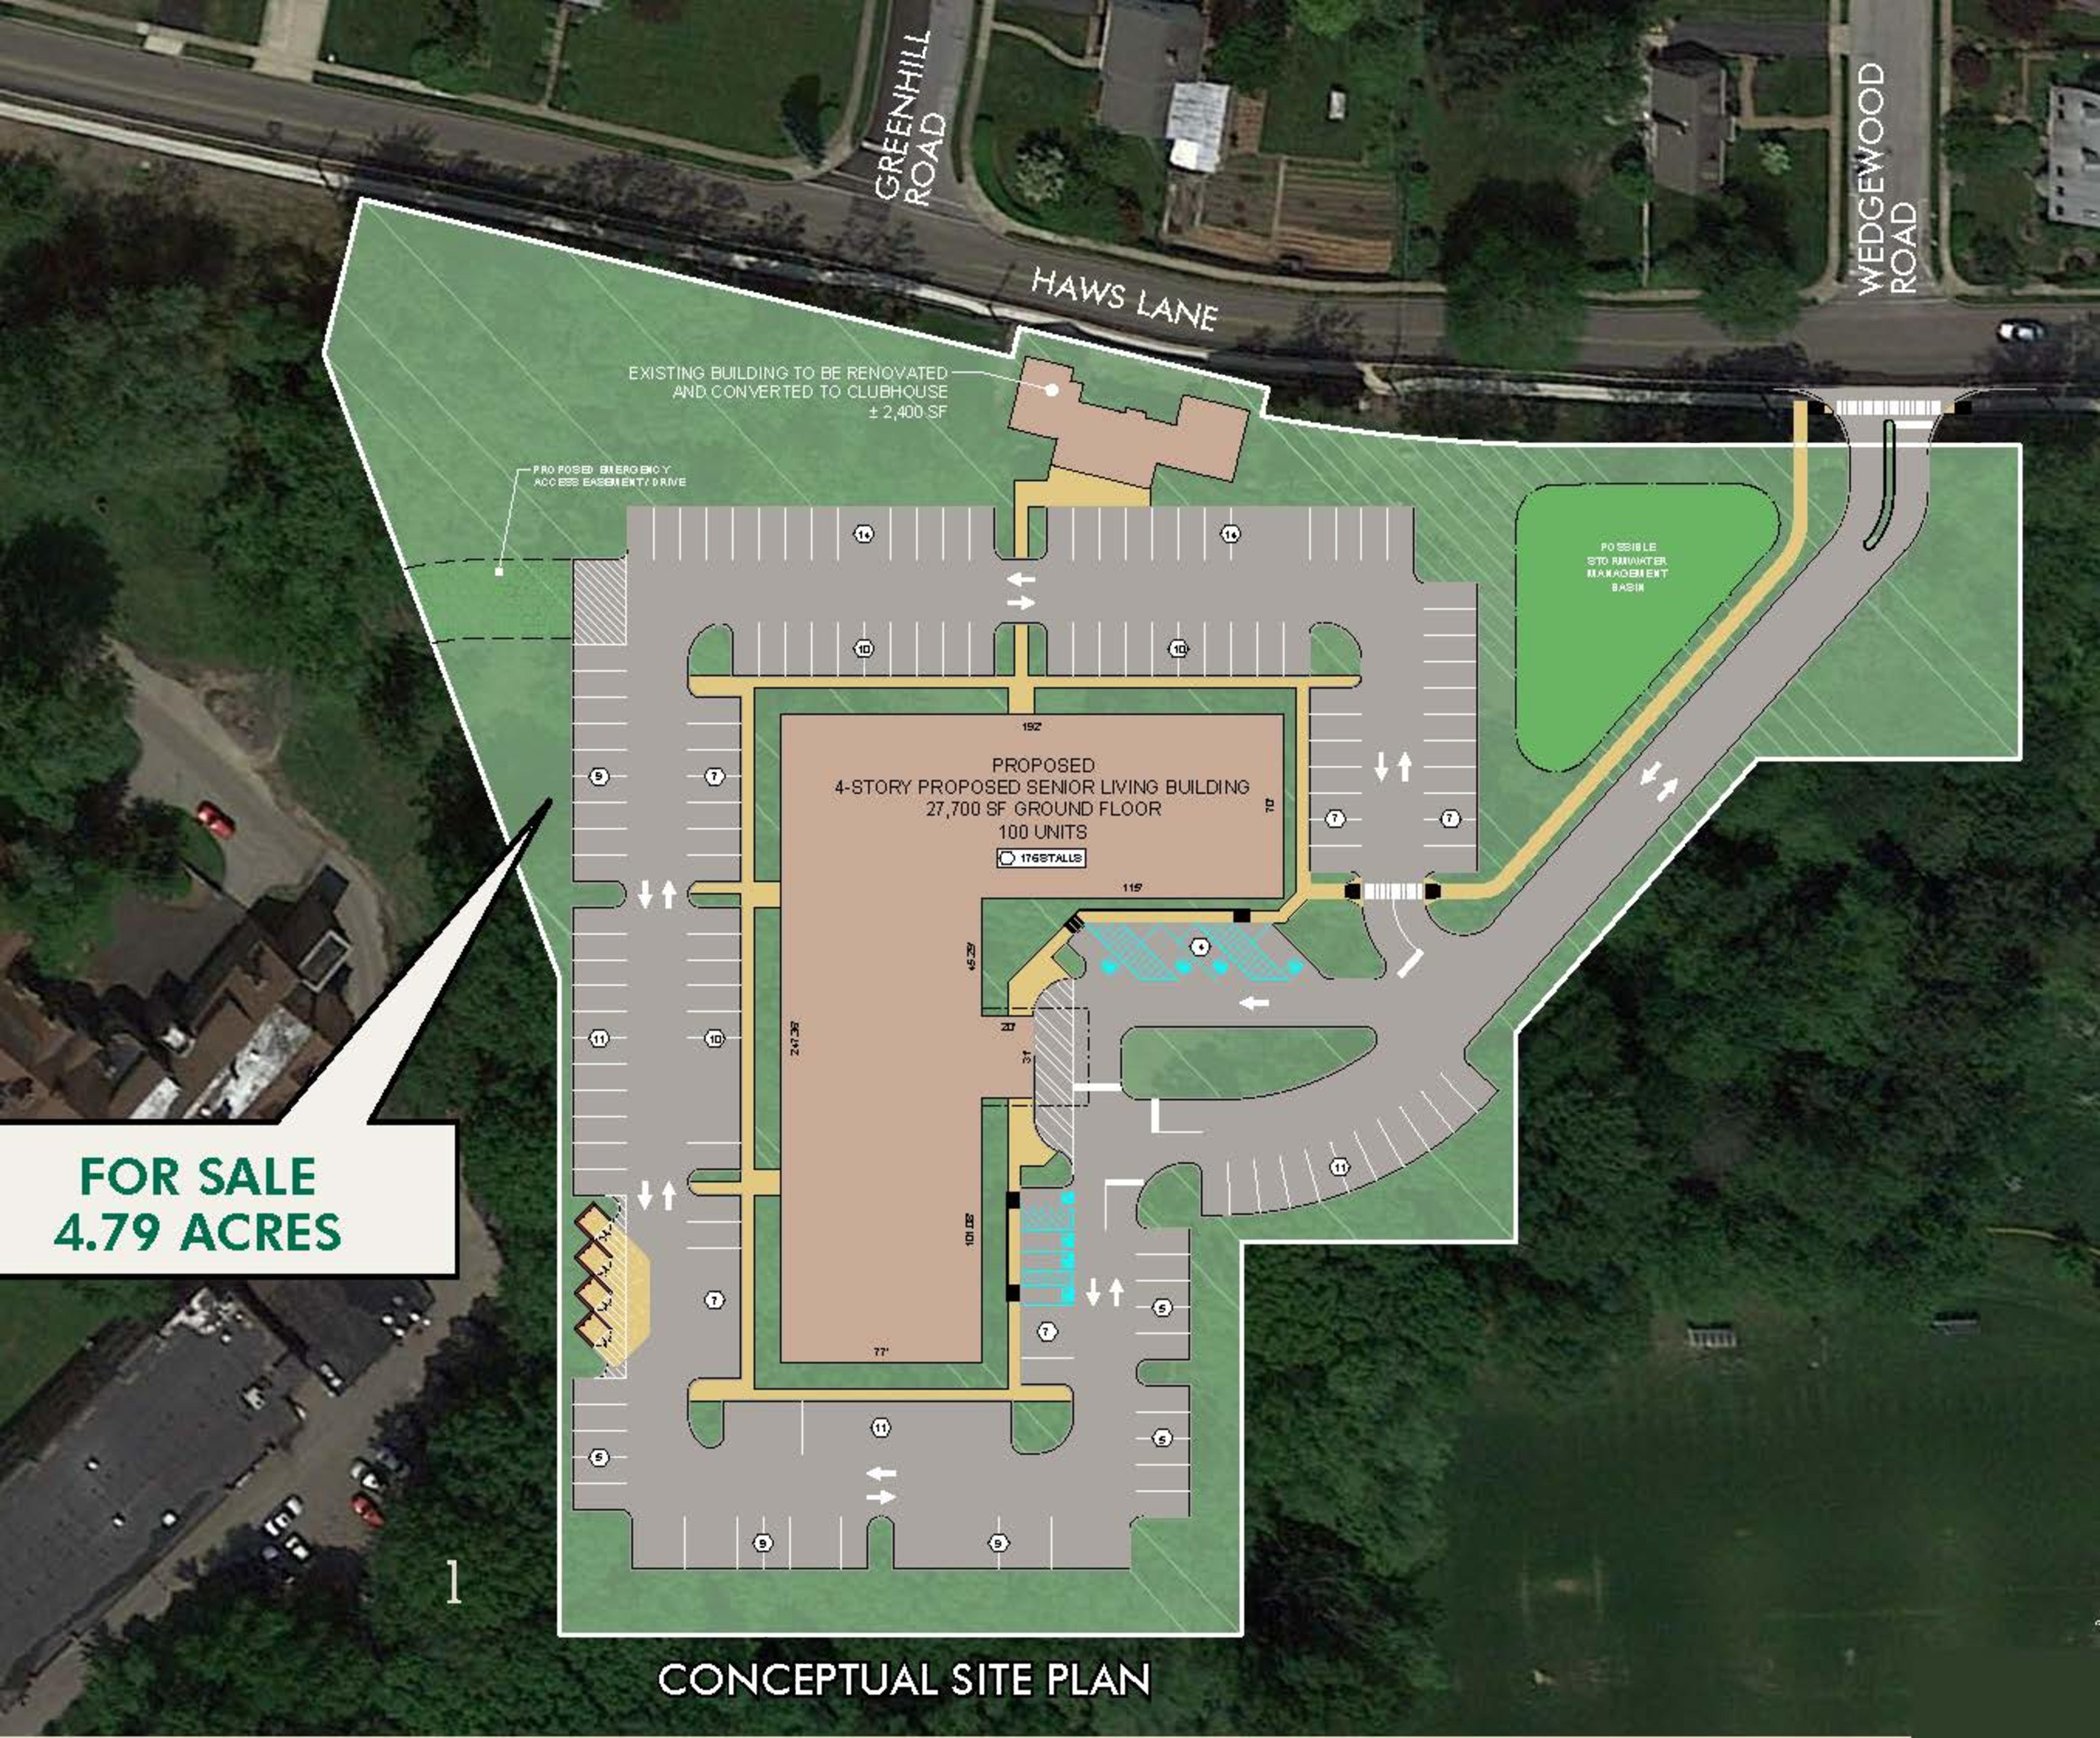 FLOURTOWN HAWS LANE: site plan